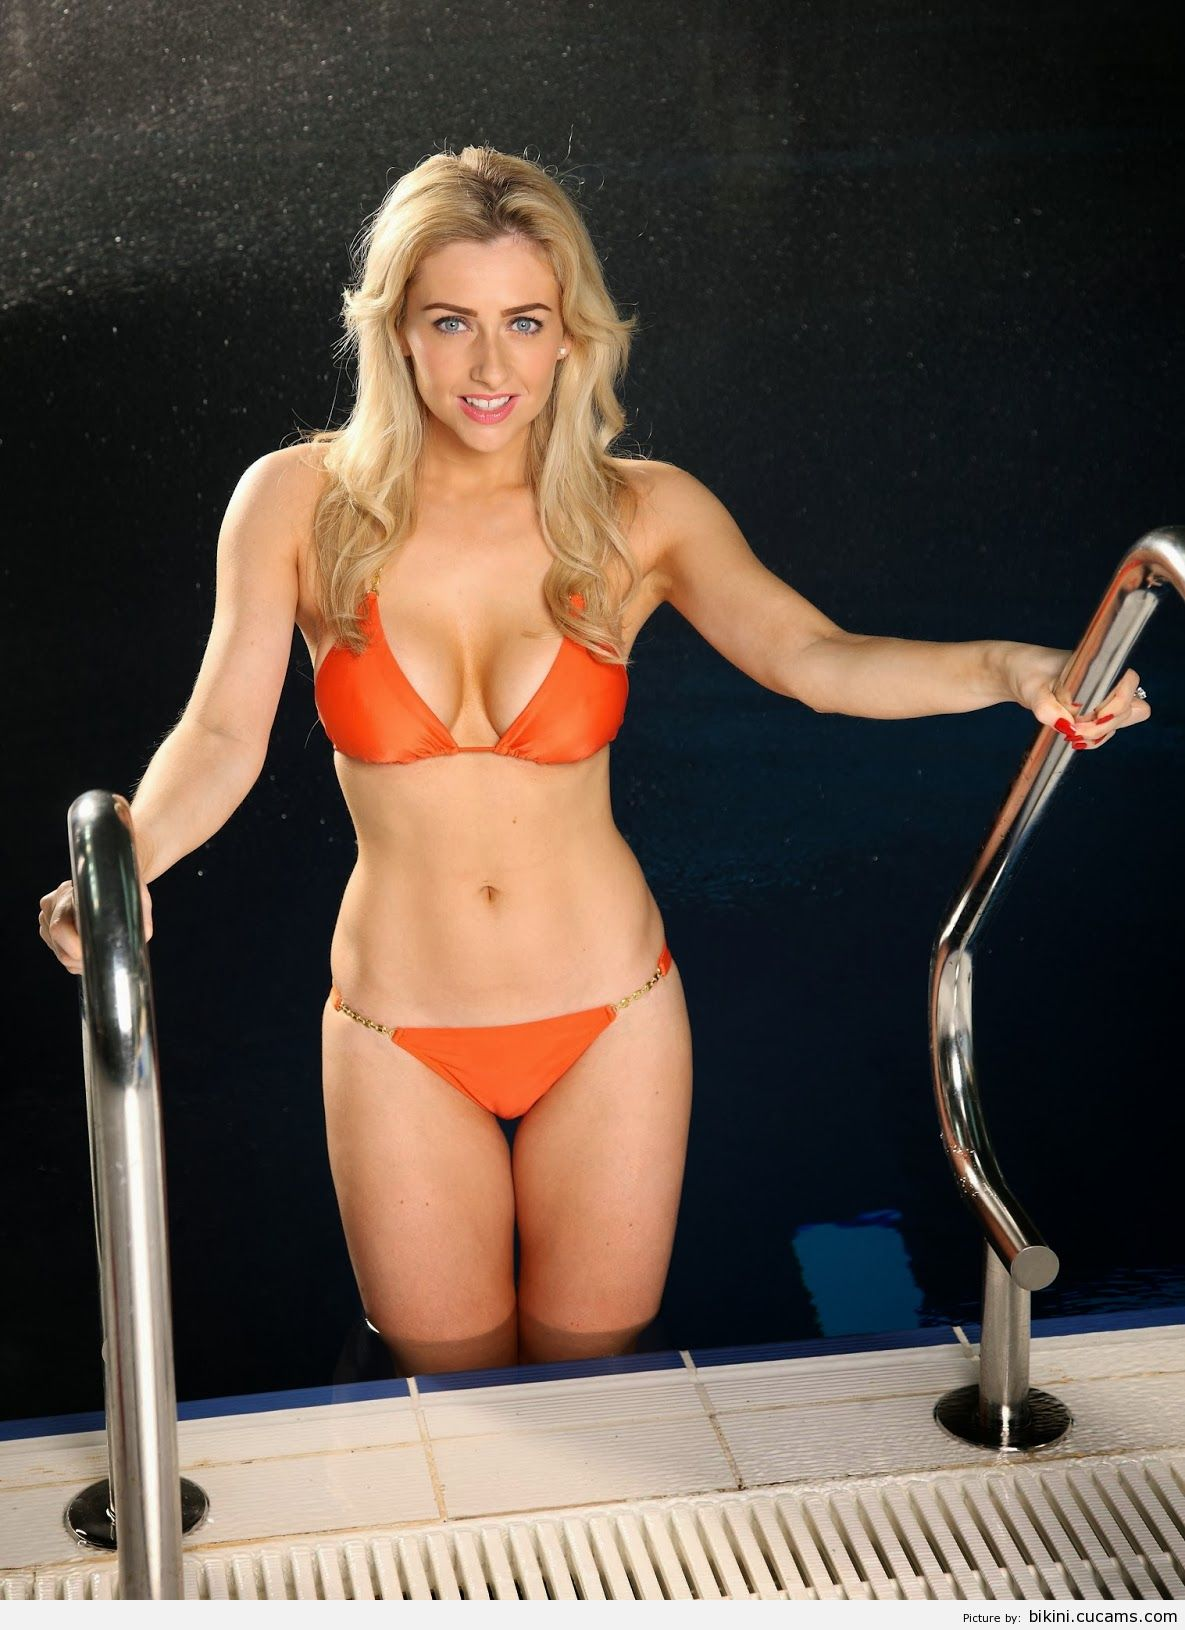 Bikini Plumber Nylon by bikini.cucams.com